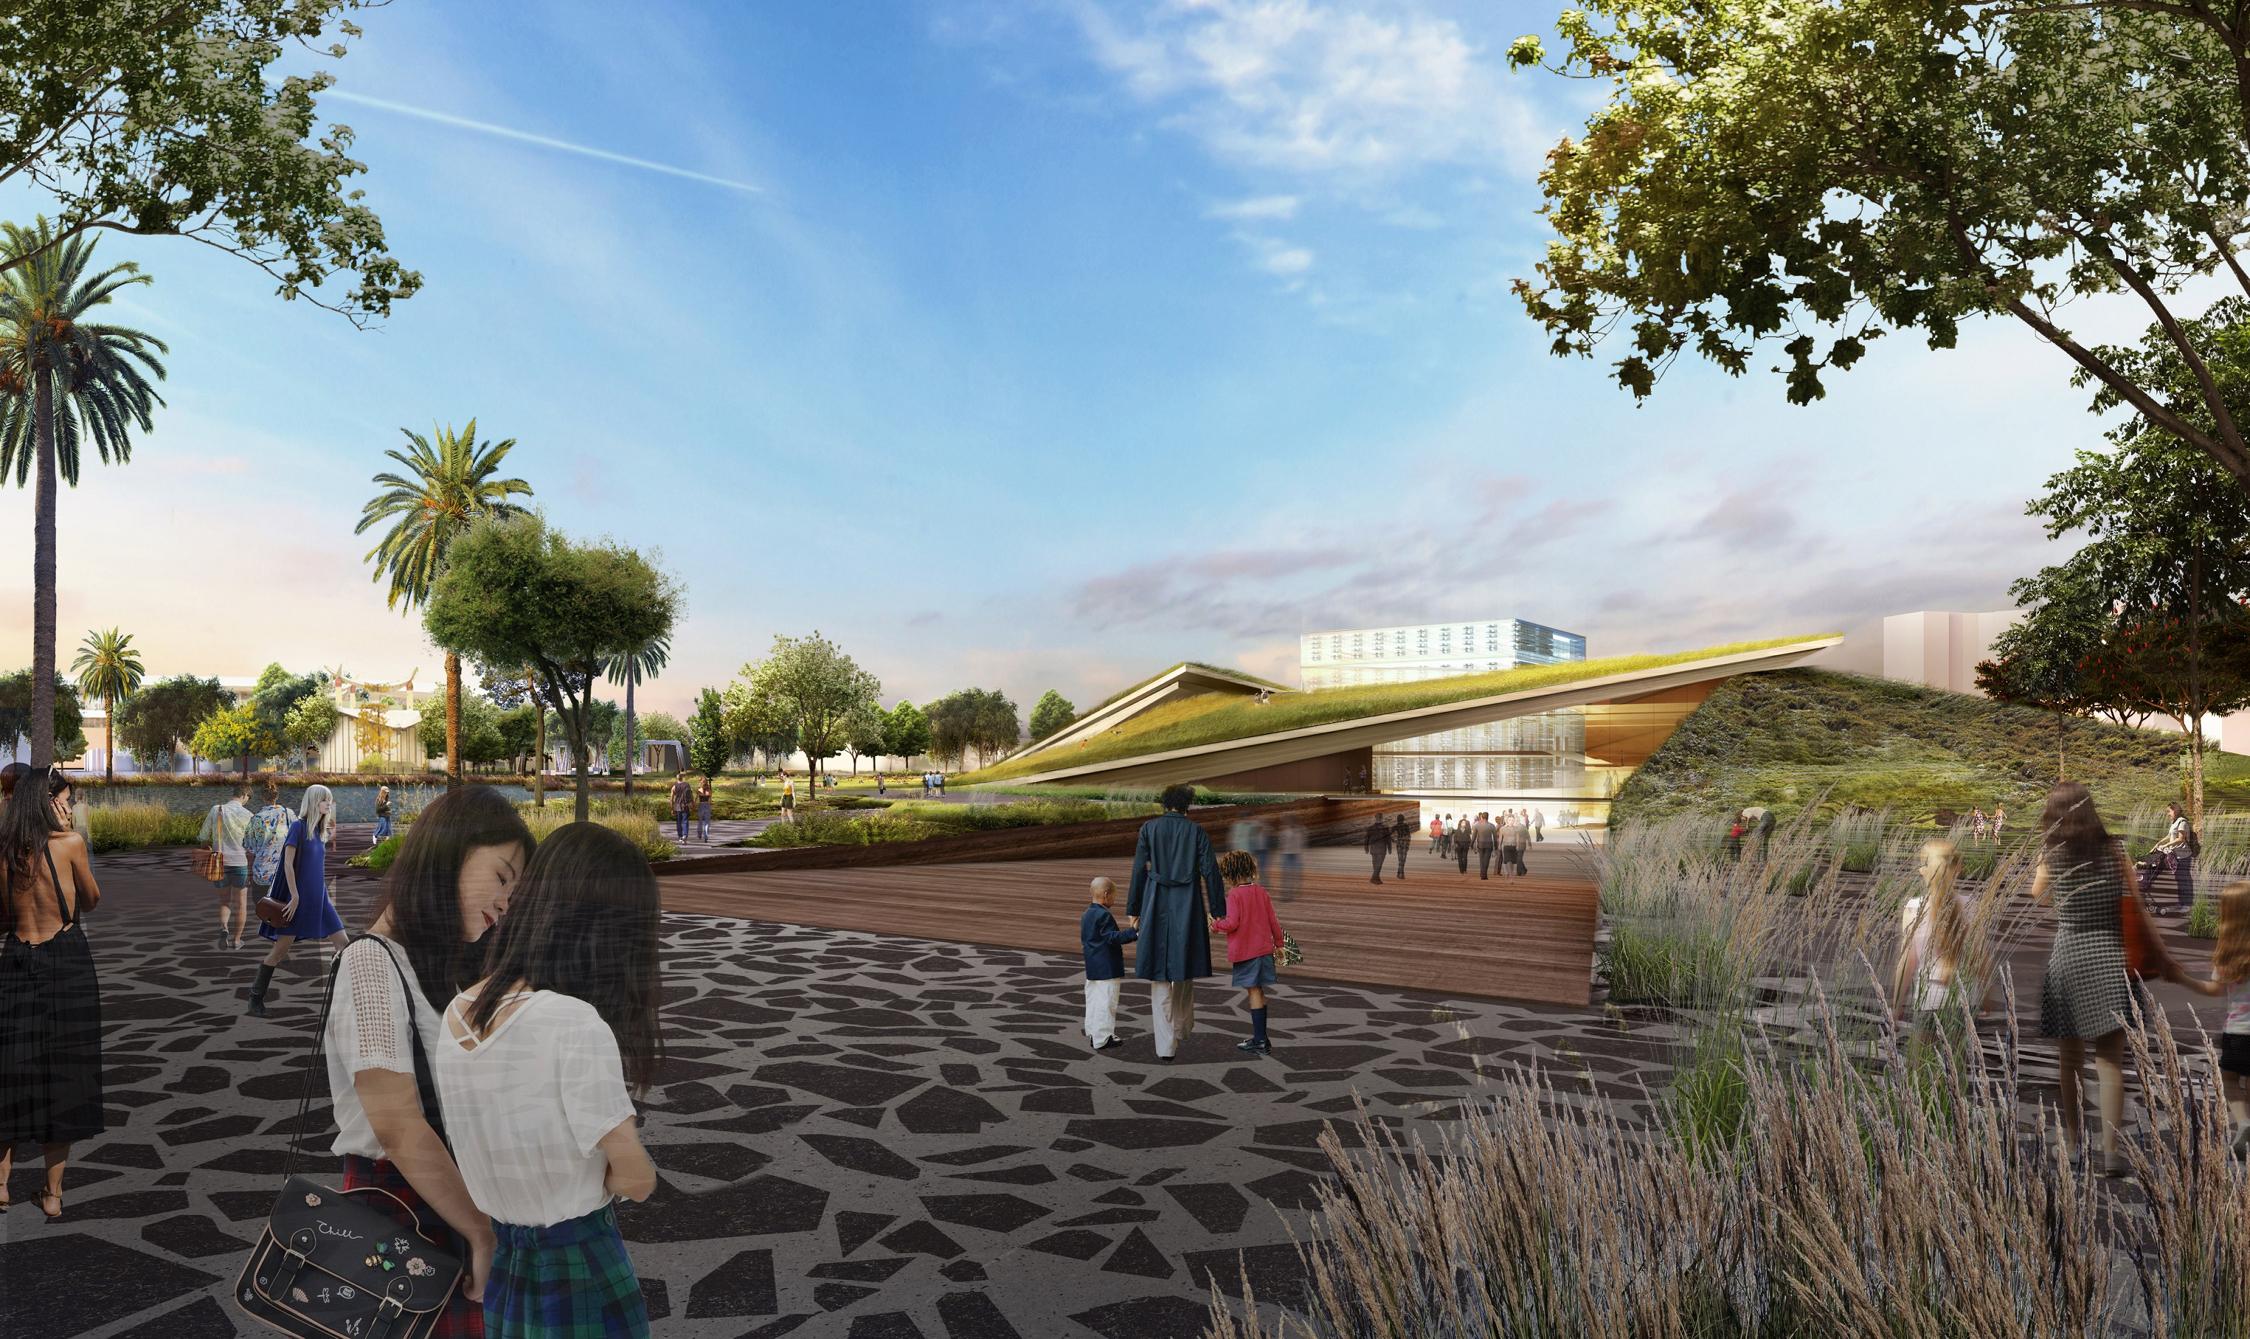 Plaza view of Diller Scofidio + Renfro's La Brea Tar Pits proposal